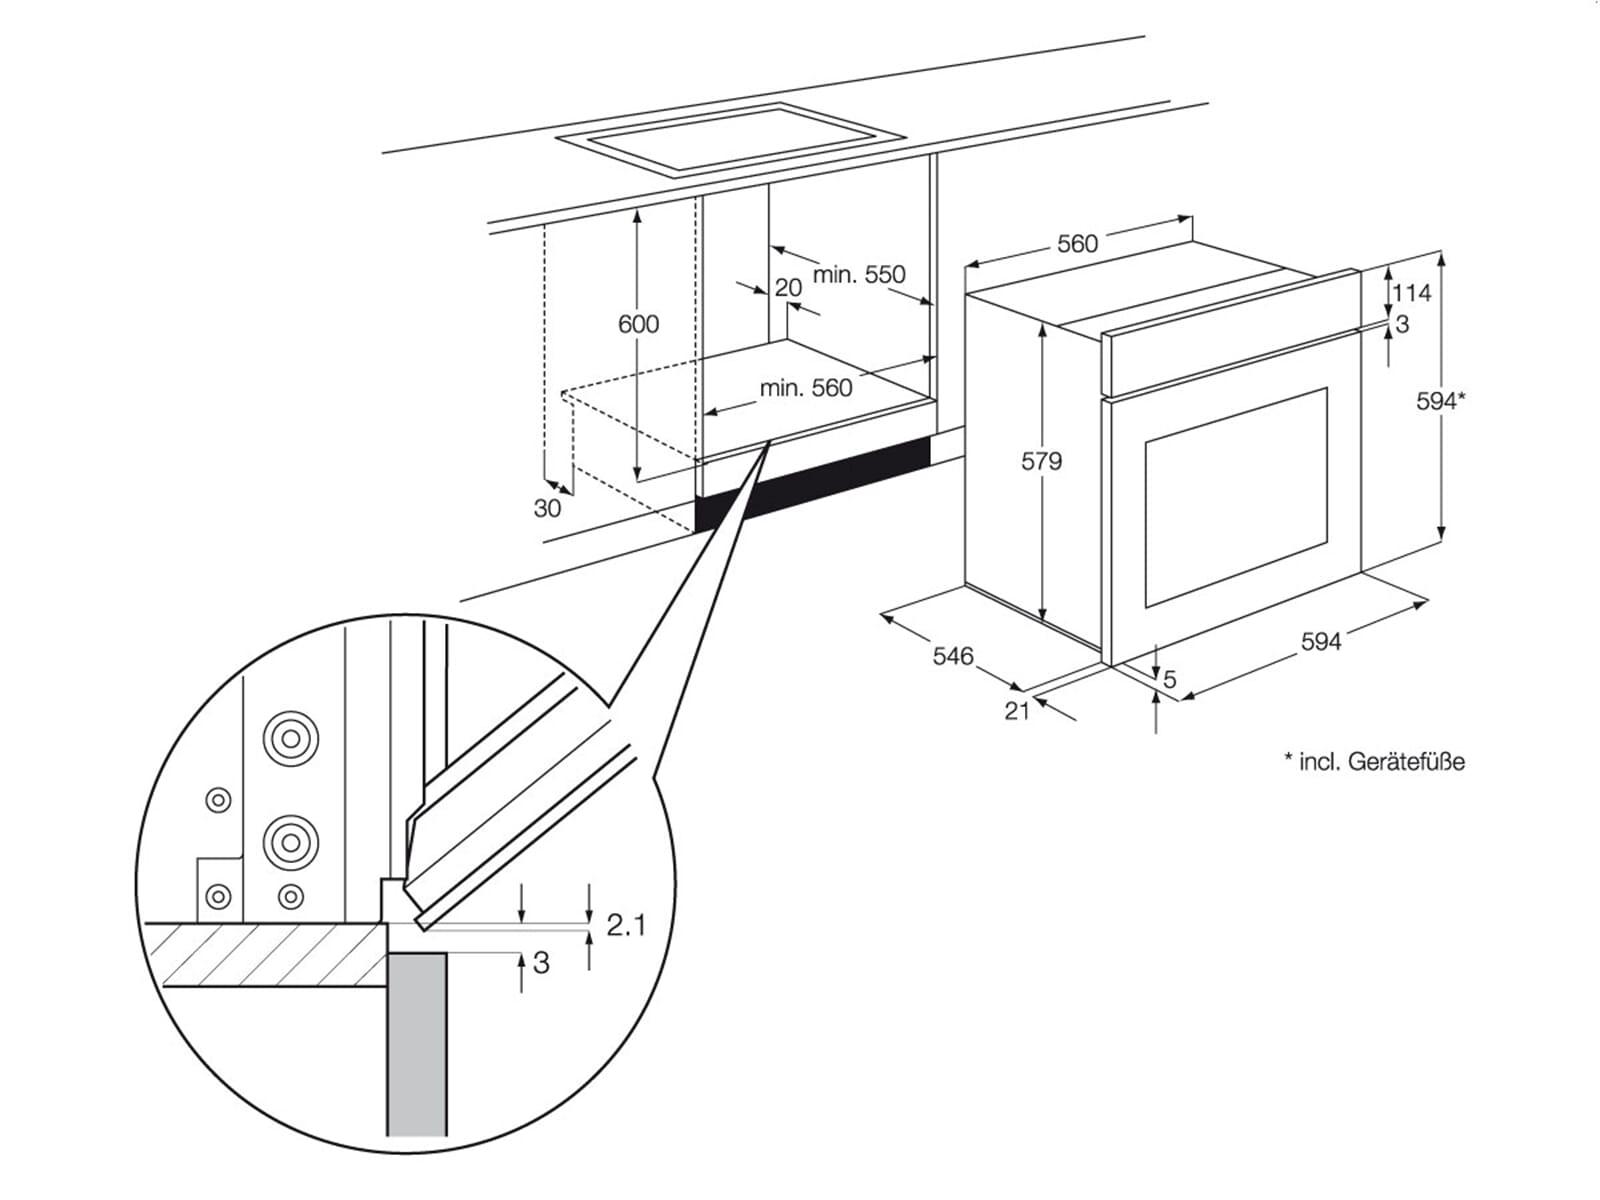 aeg electrolux eon3010aax einbau herd edelstahl f r 278 90. Black Bedroom Furniture Sets. Home Design Ideas